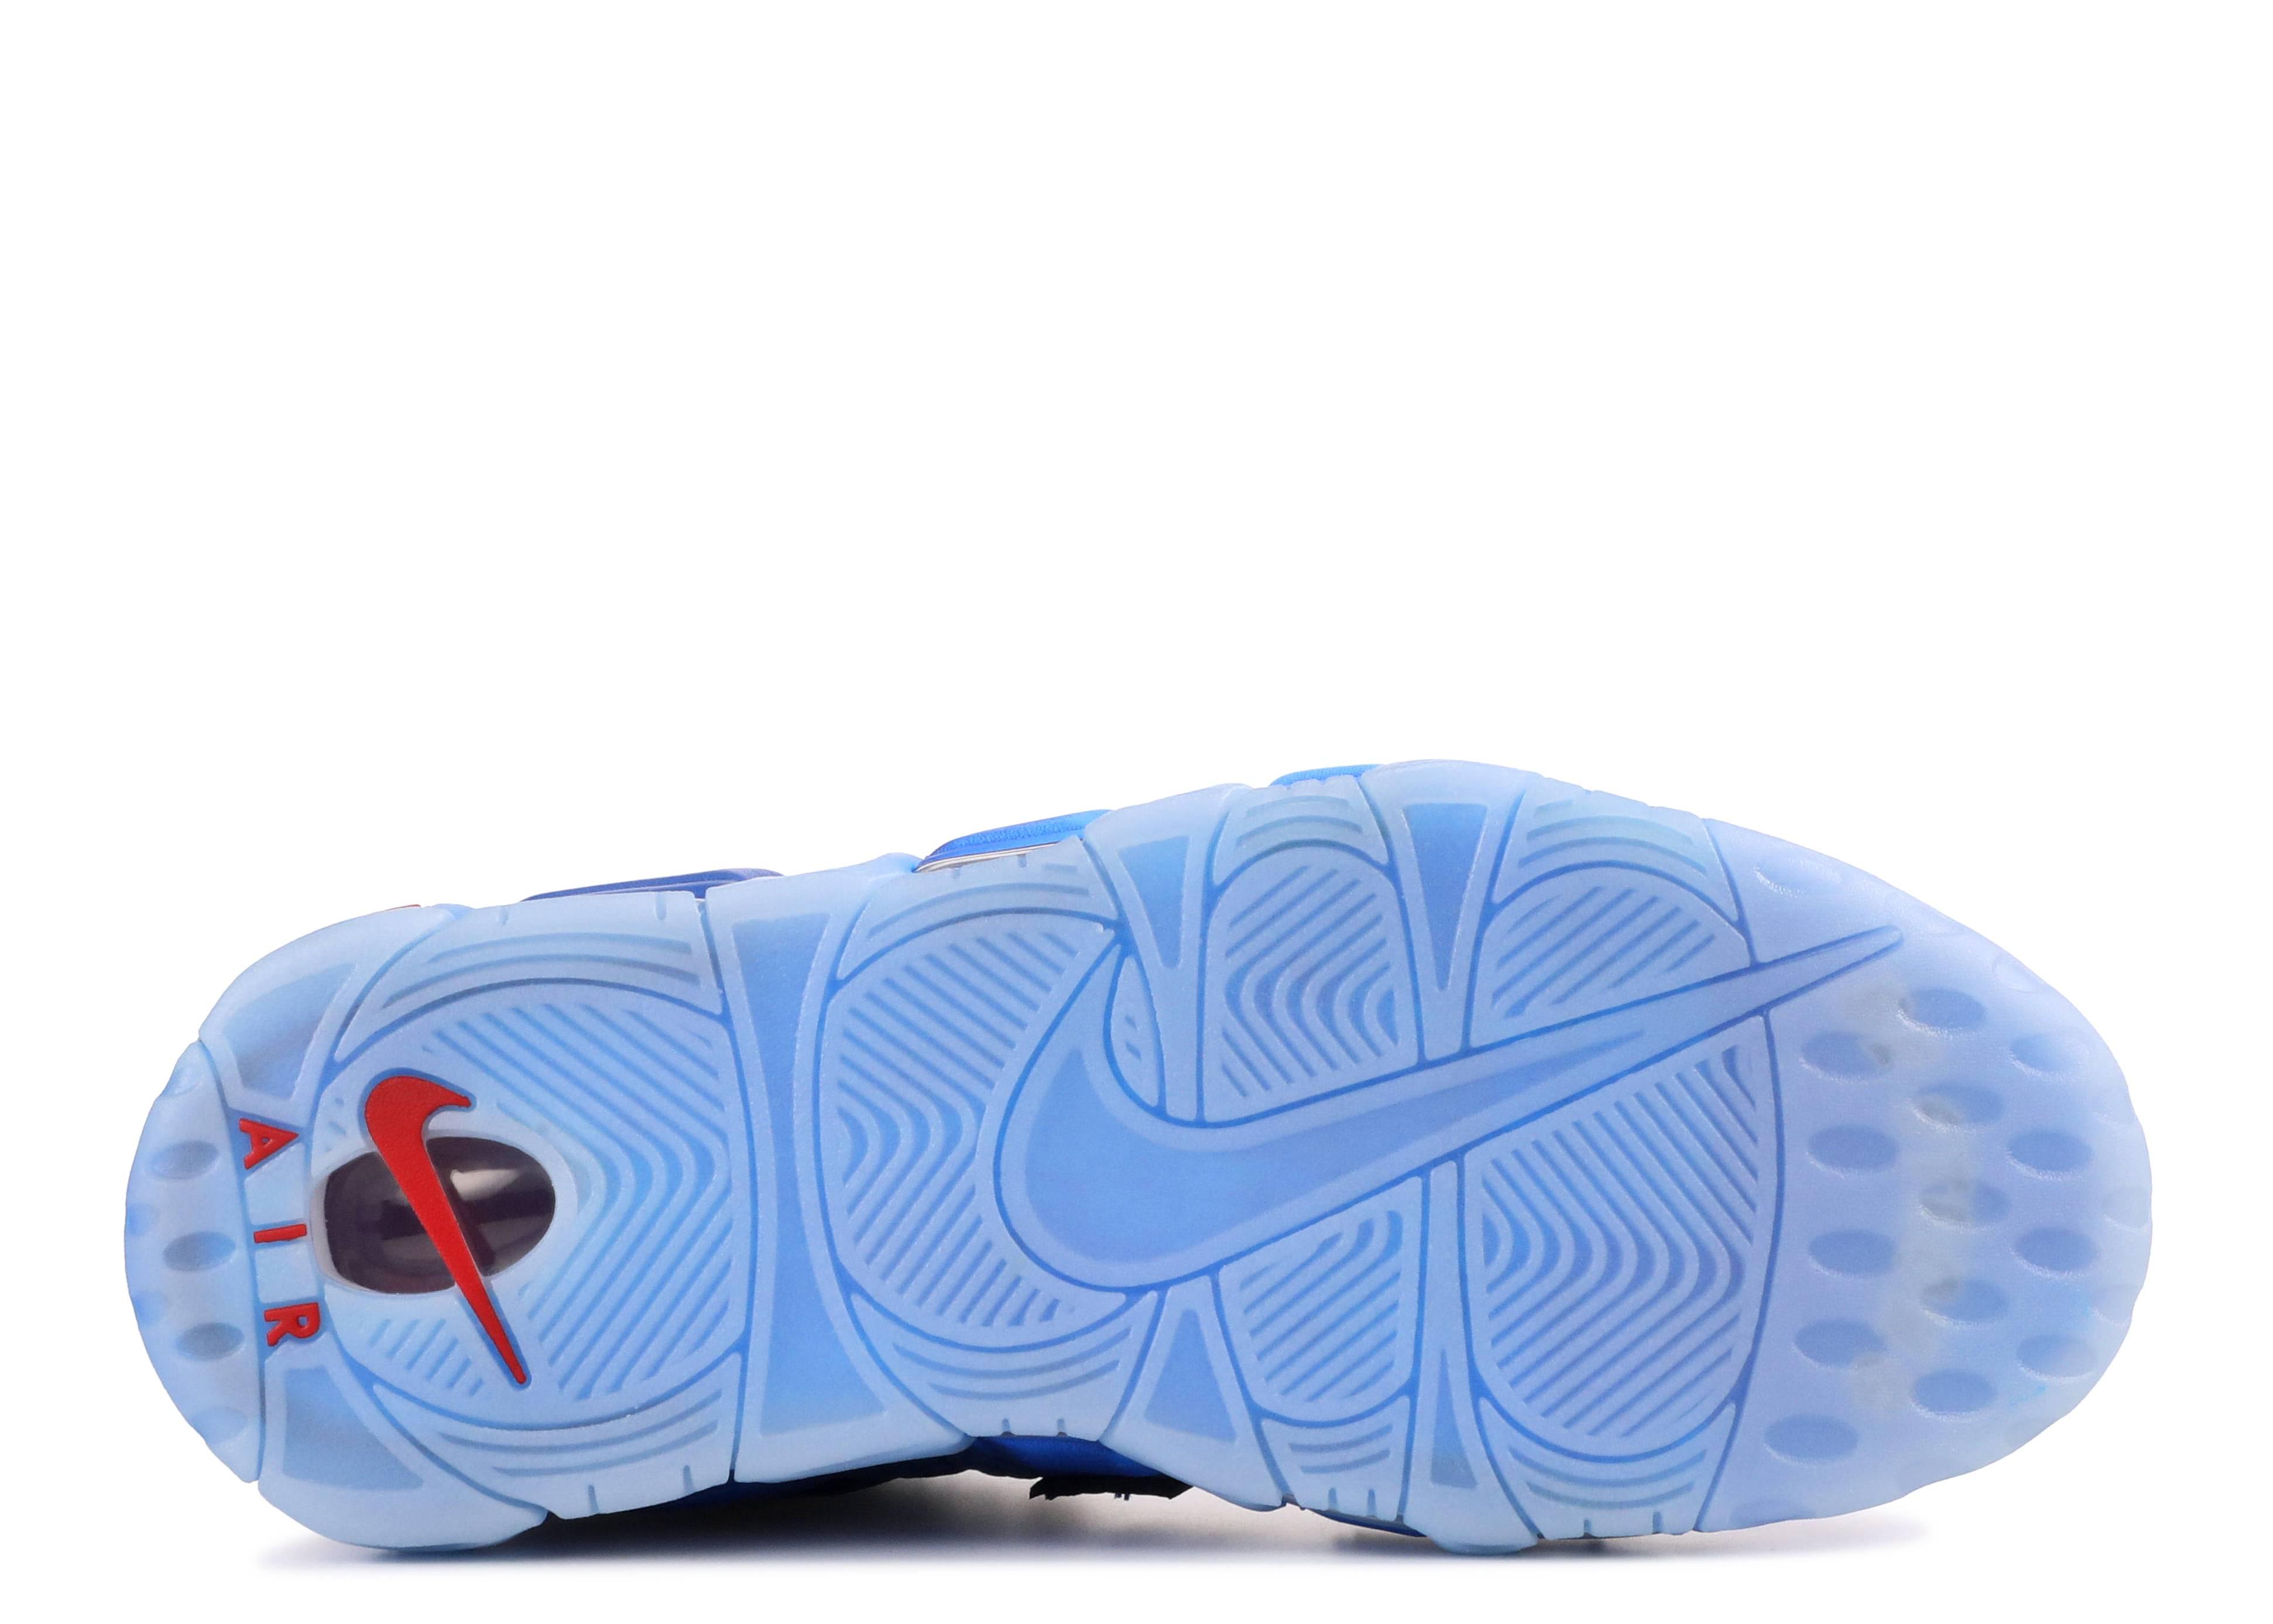 Nike Air More Uptempo DB